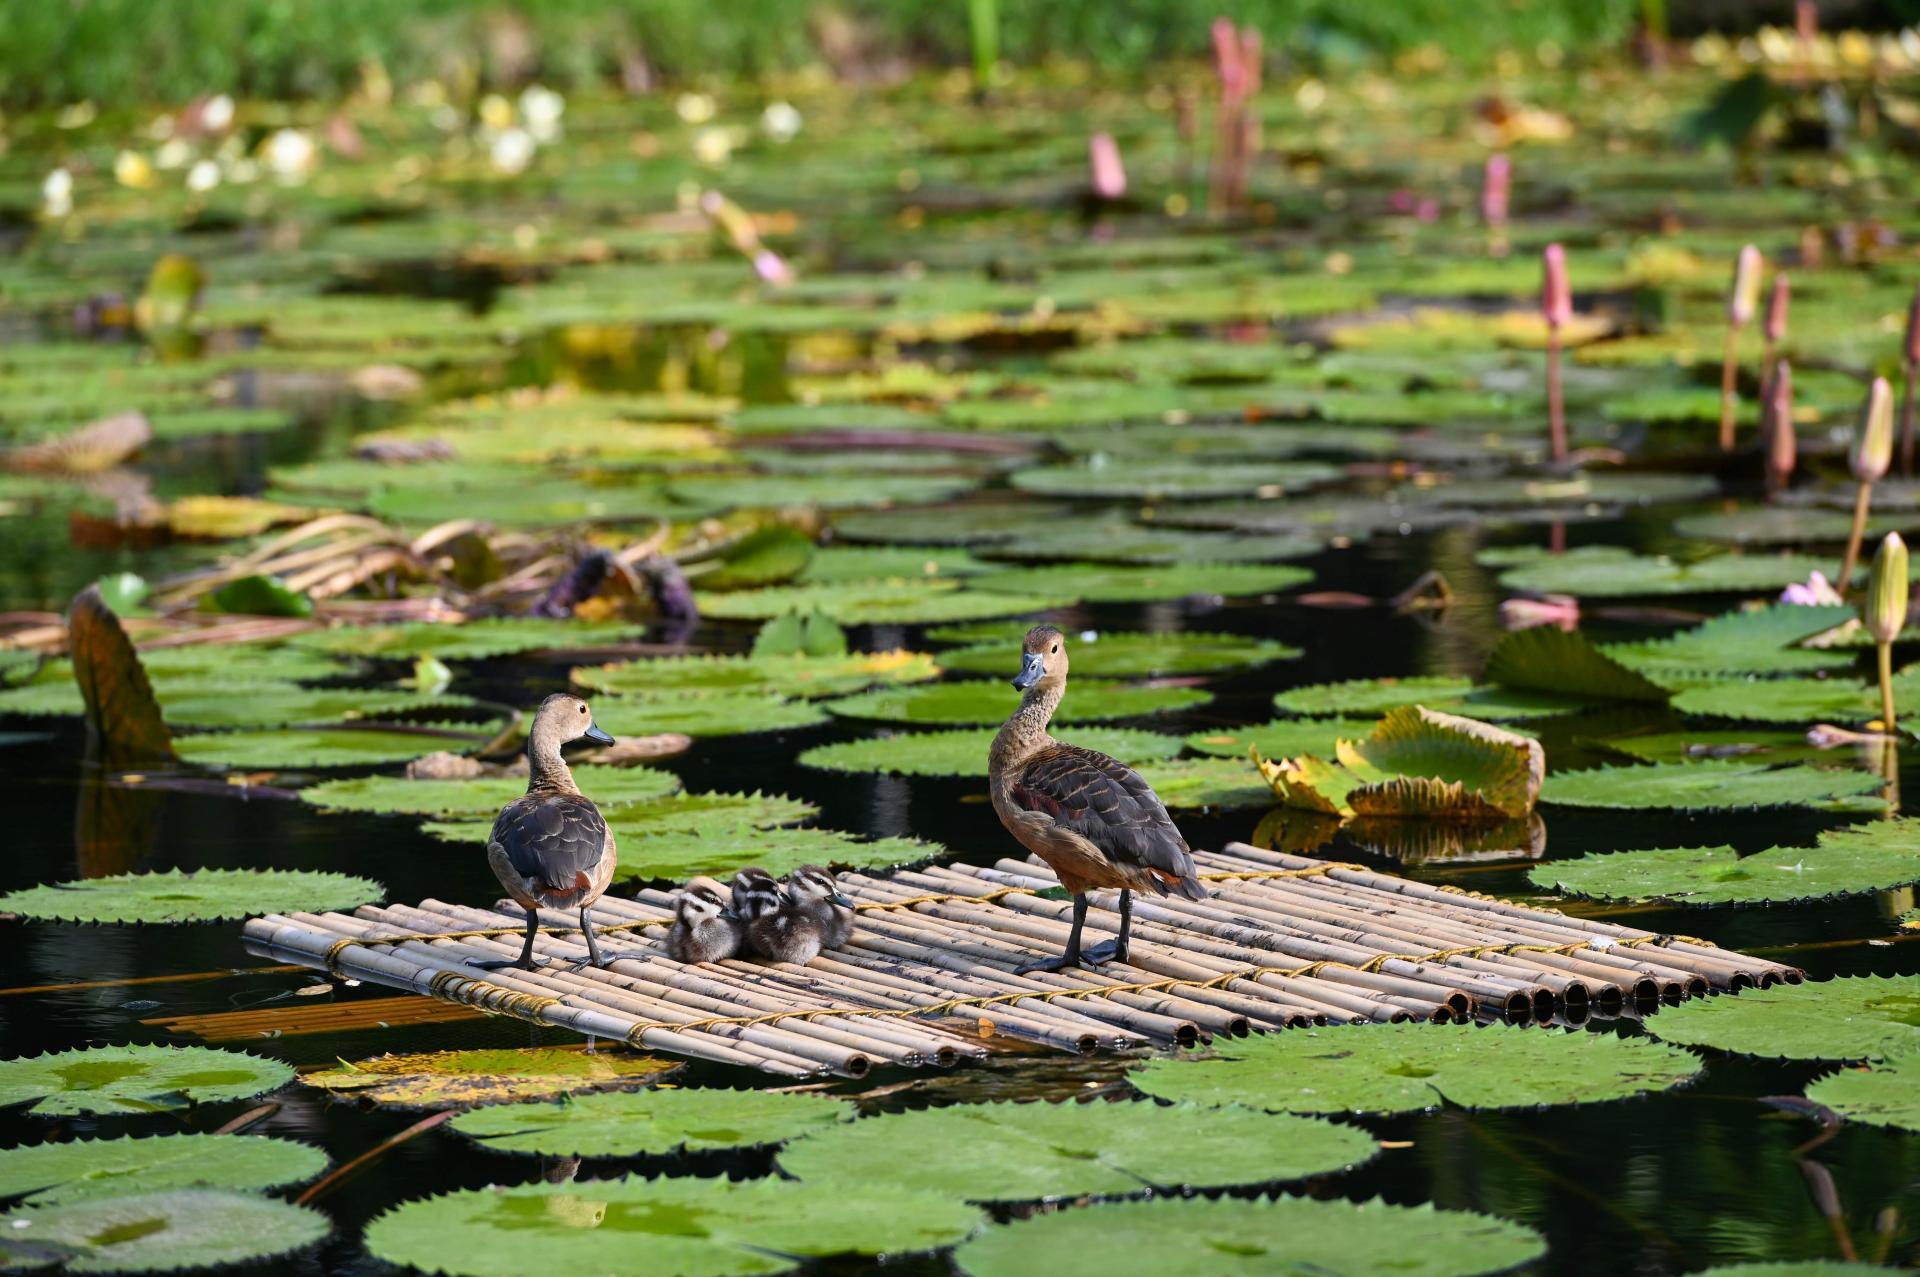 Семья утят на пруду в Сингапуре